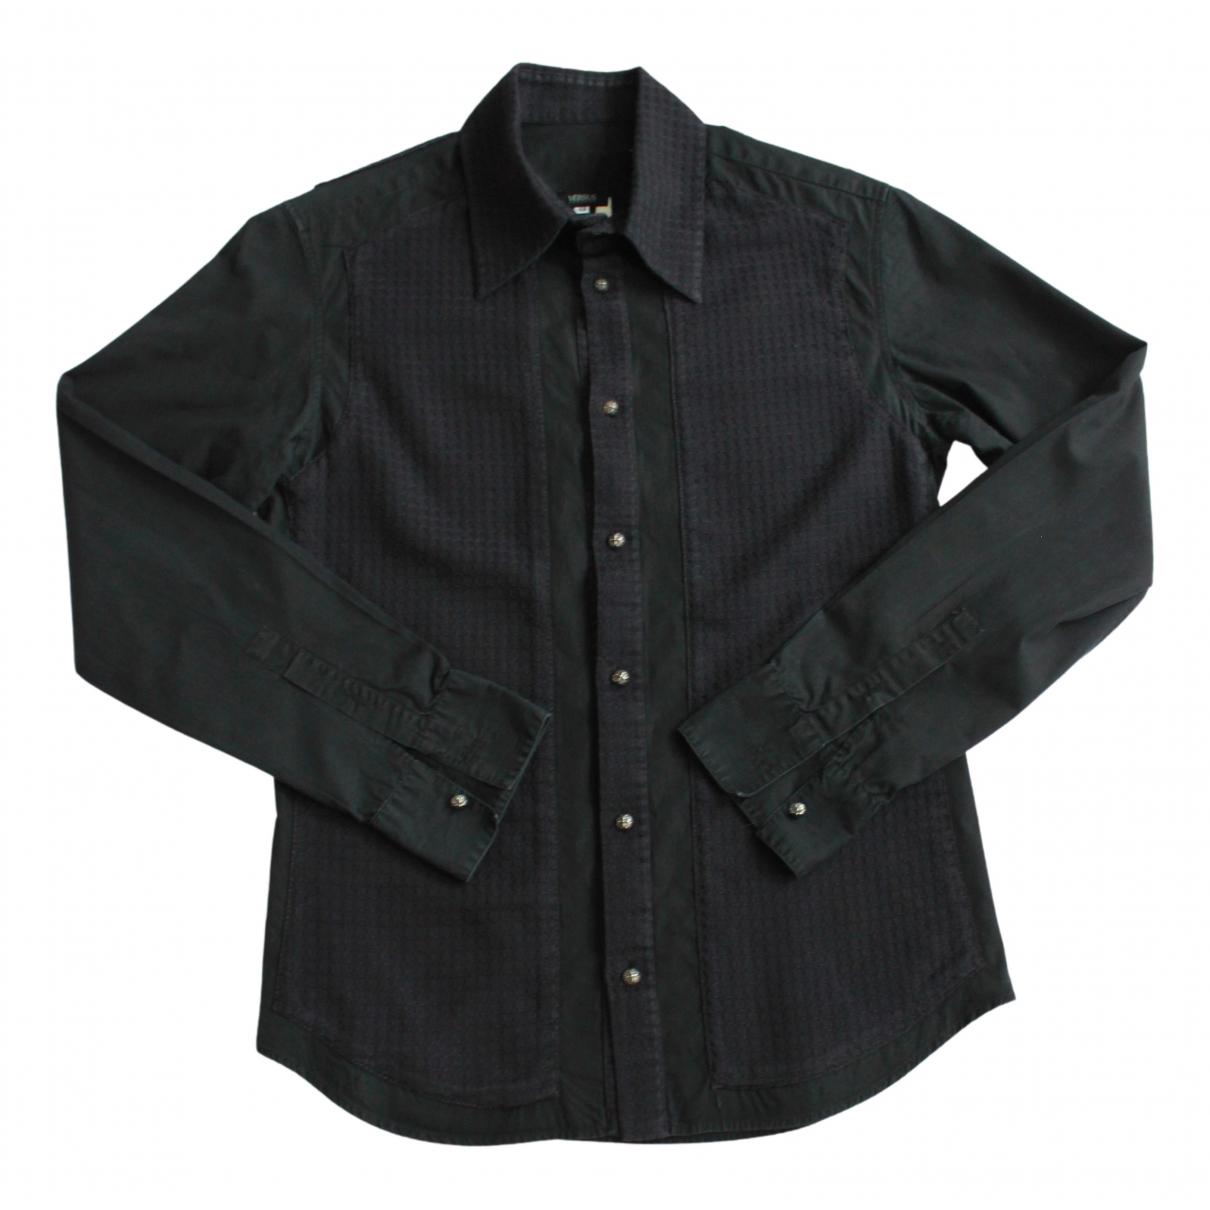 Jc De Castelbajac N Black Cotton Shirts for Men M International